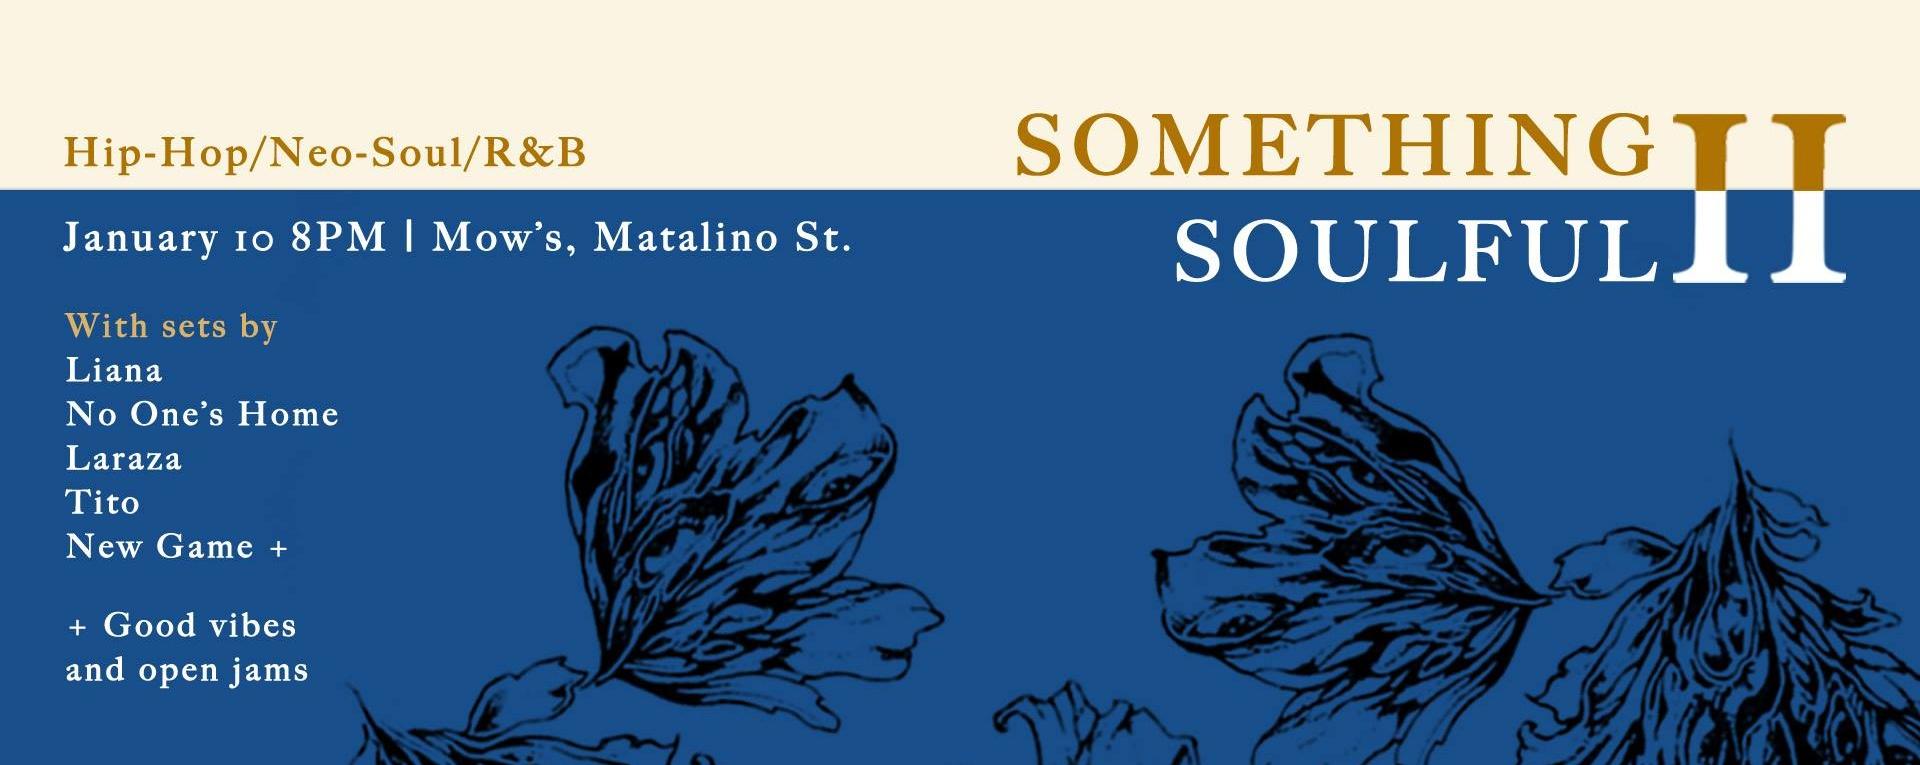 Something Soulful Vol. 2